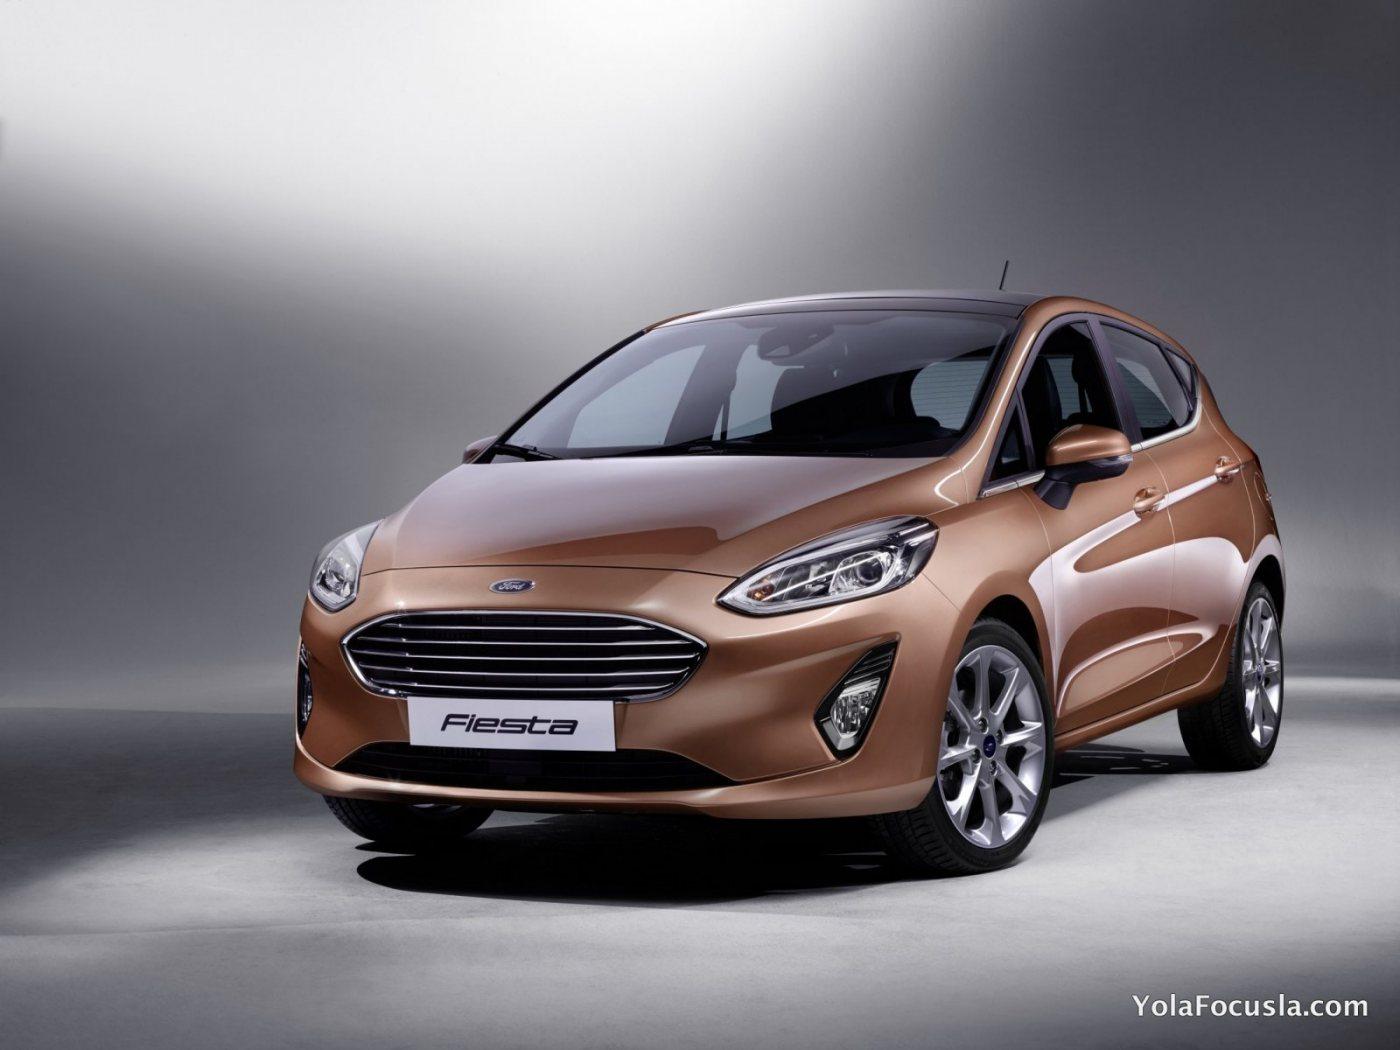 2017-Ford-Fiesta5.jpg